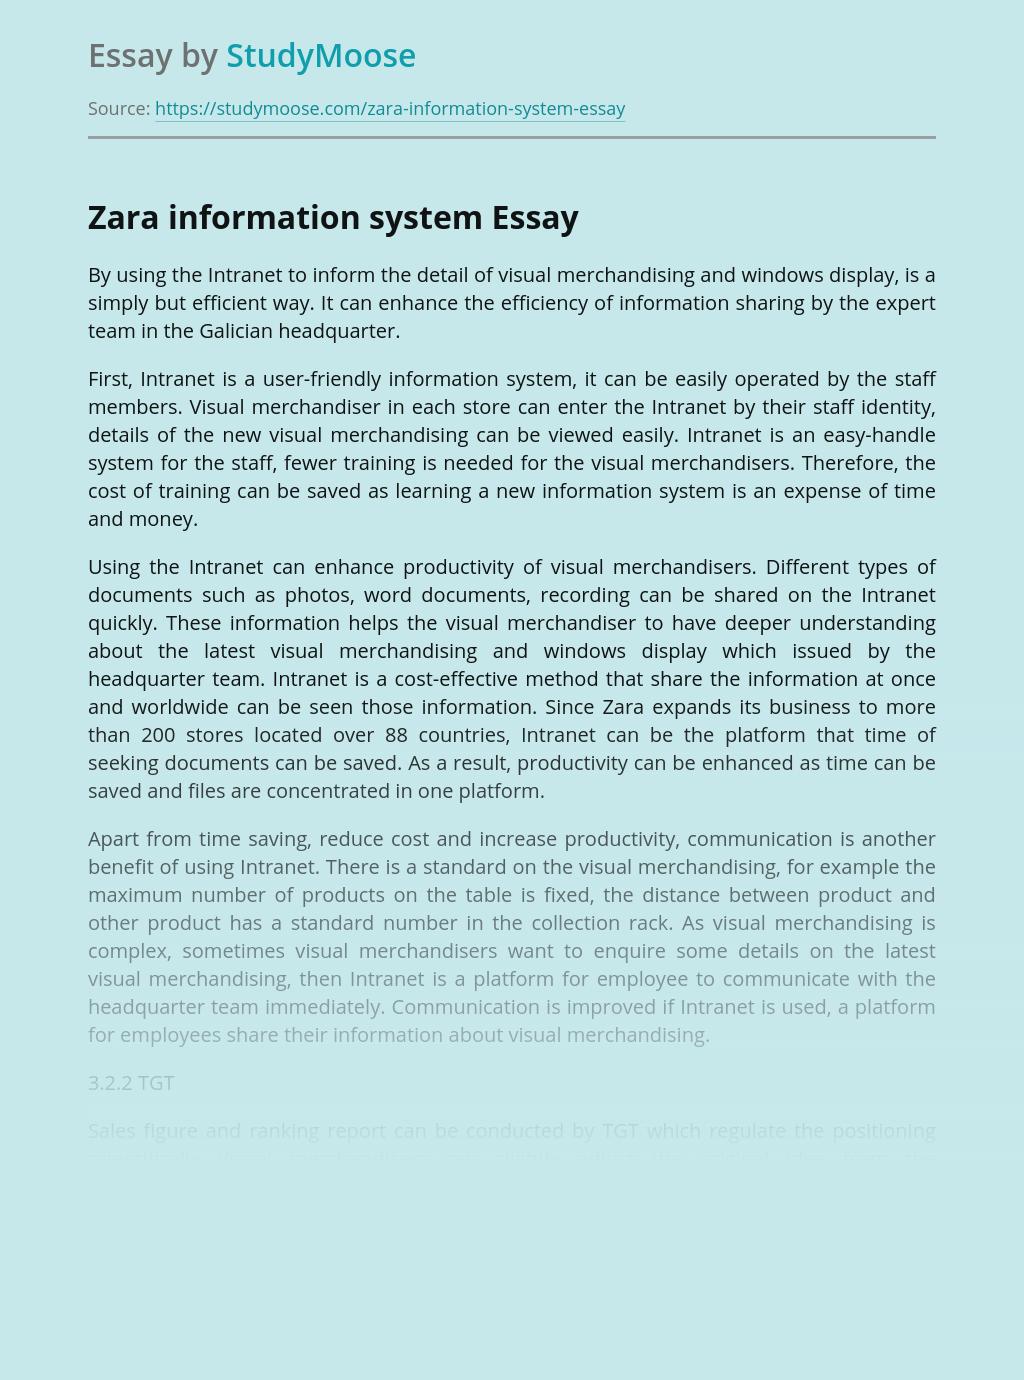 Zara Information System